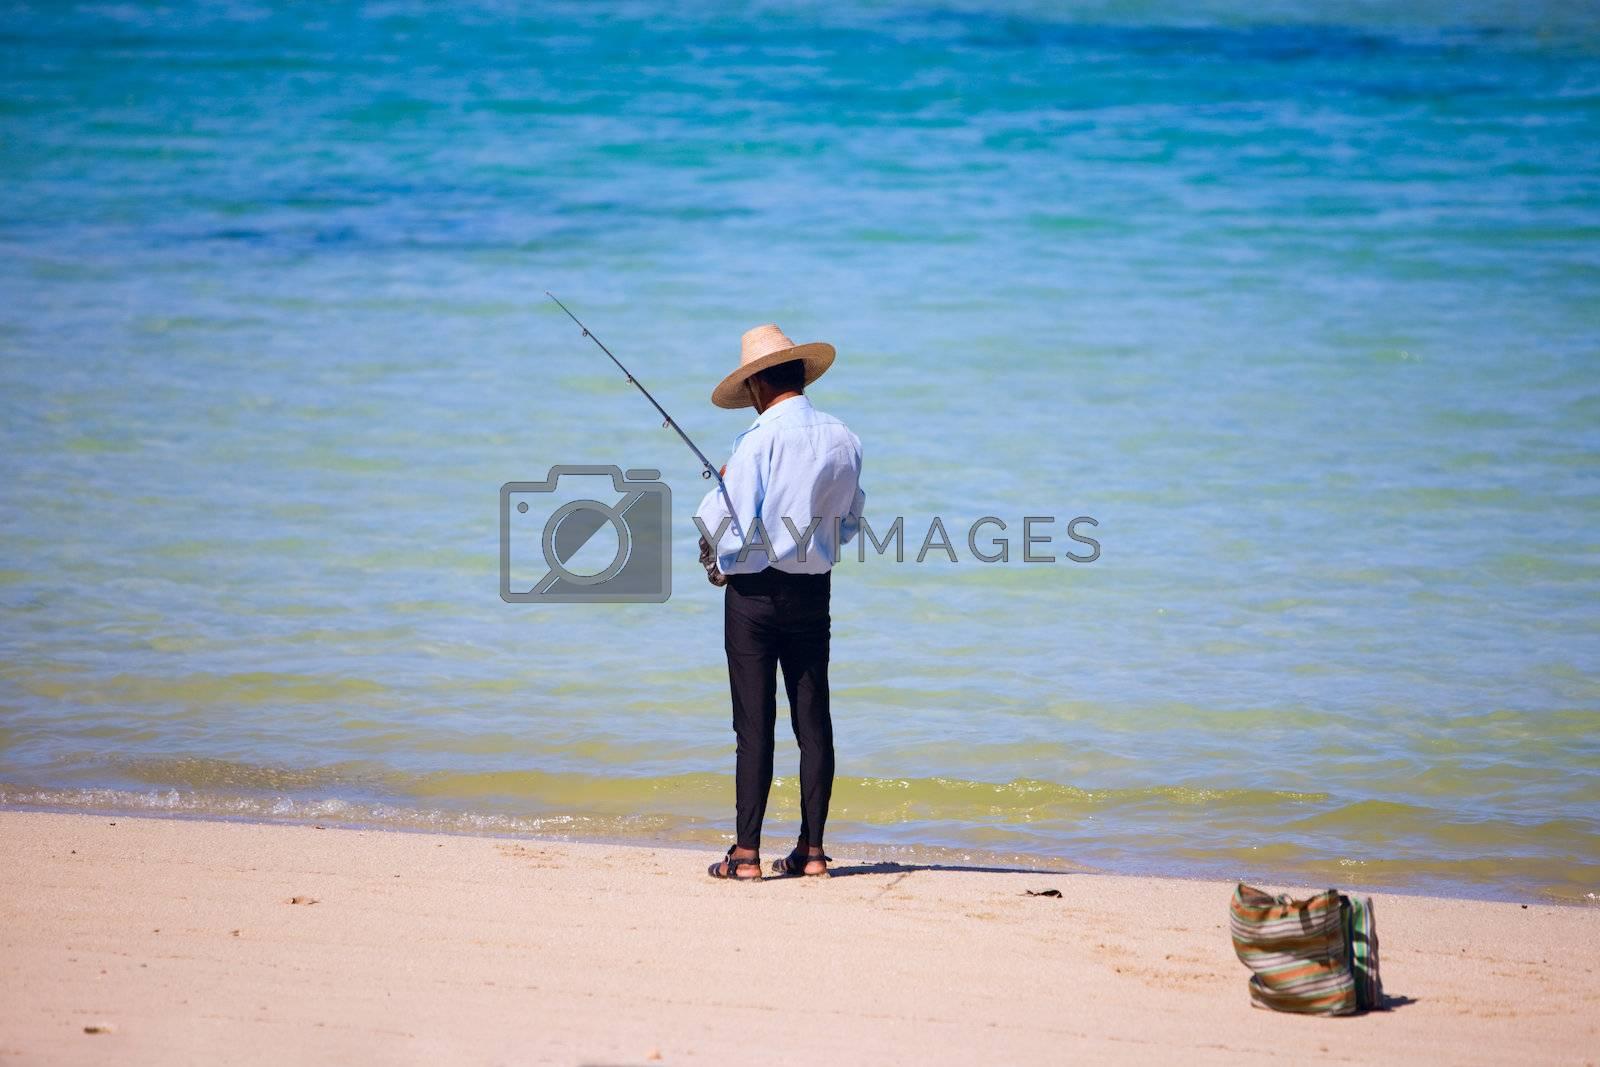 Fisherman fishing from beach. Lifestyle scene from Mauritius